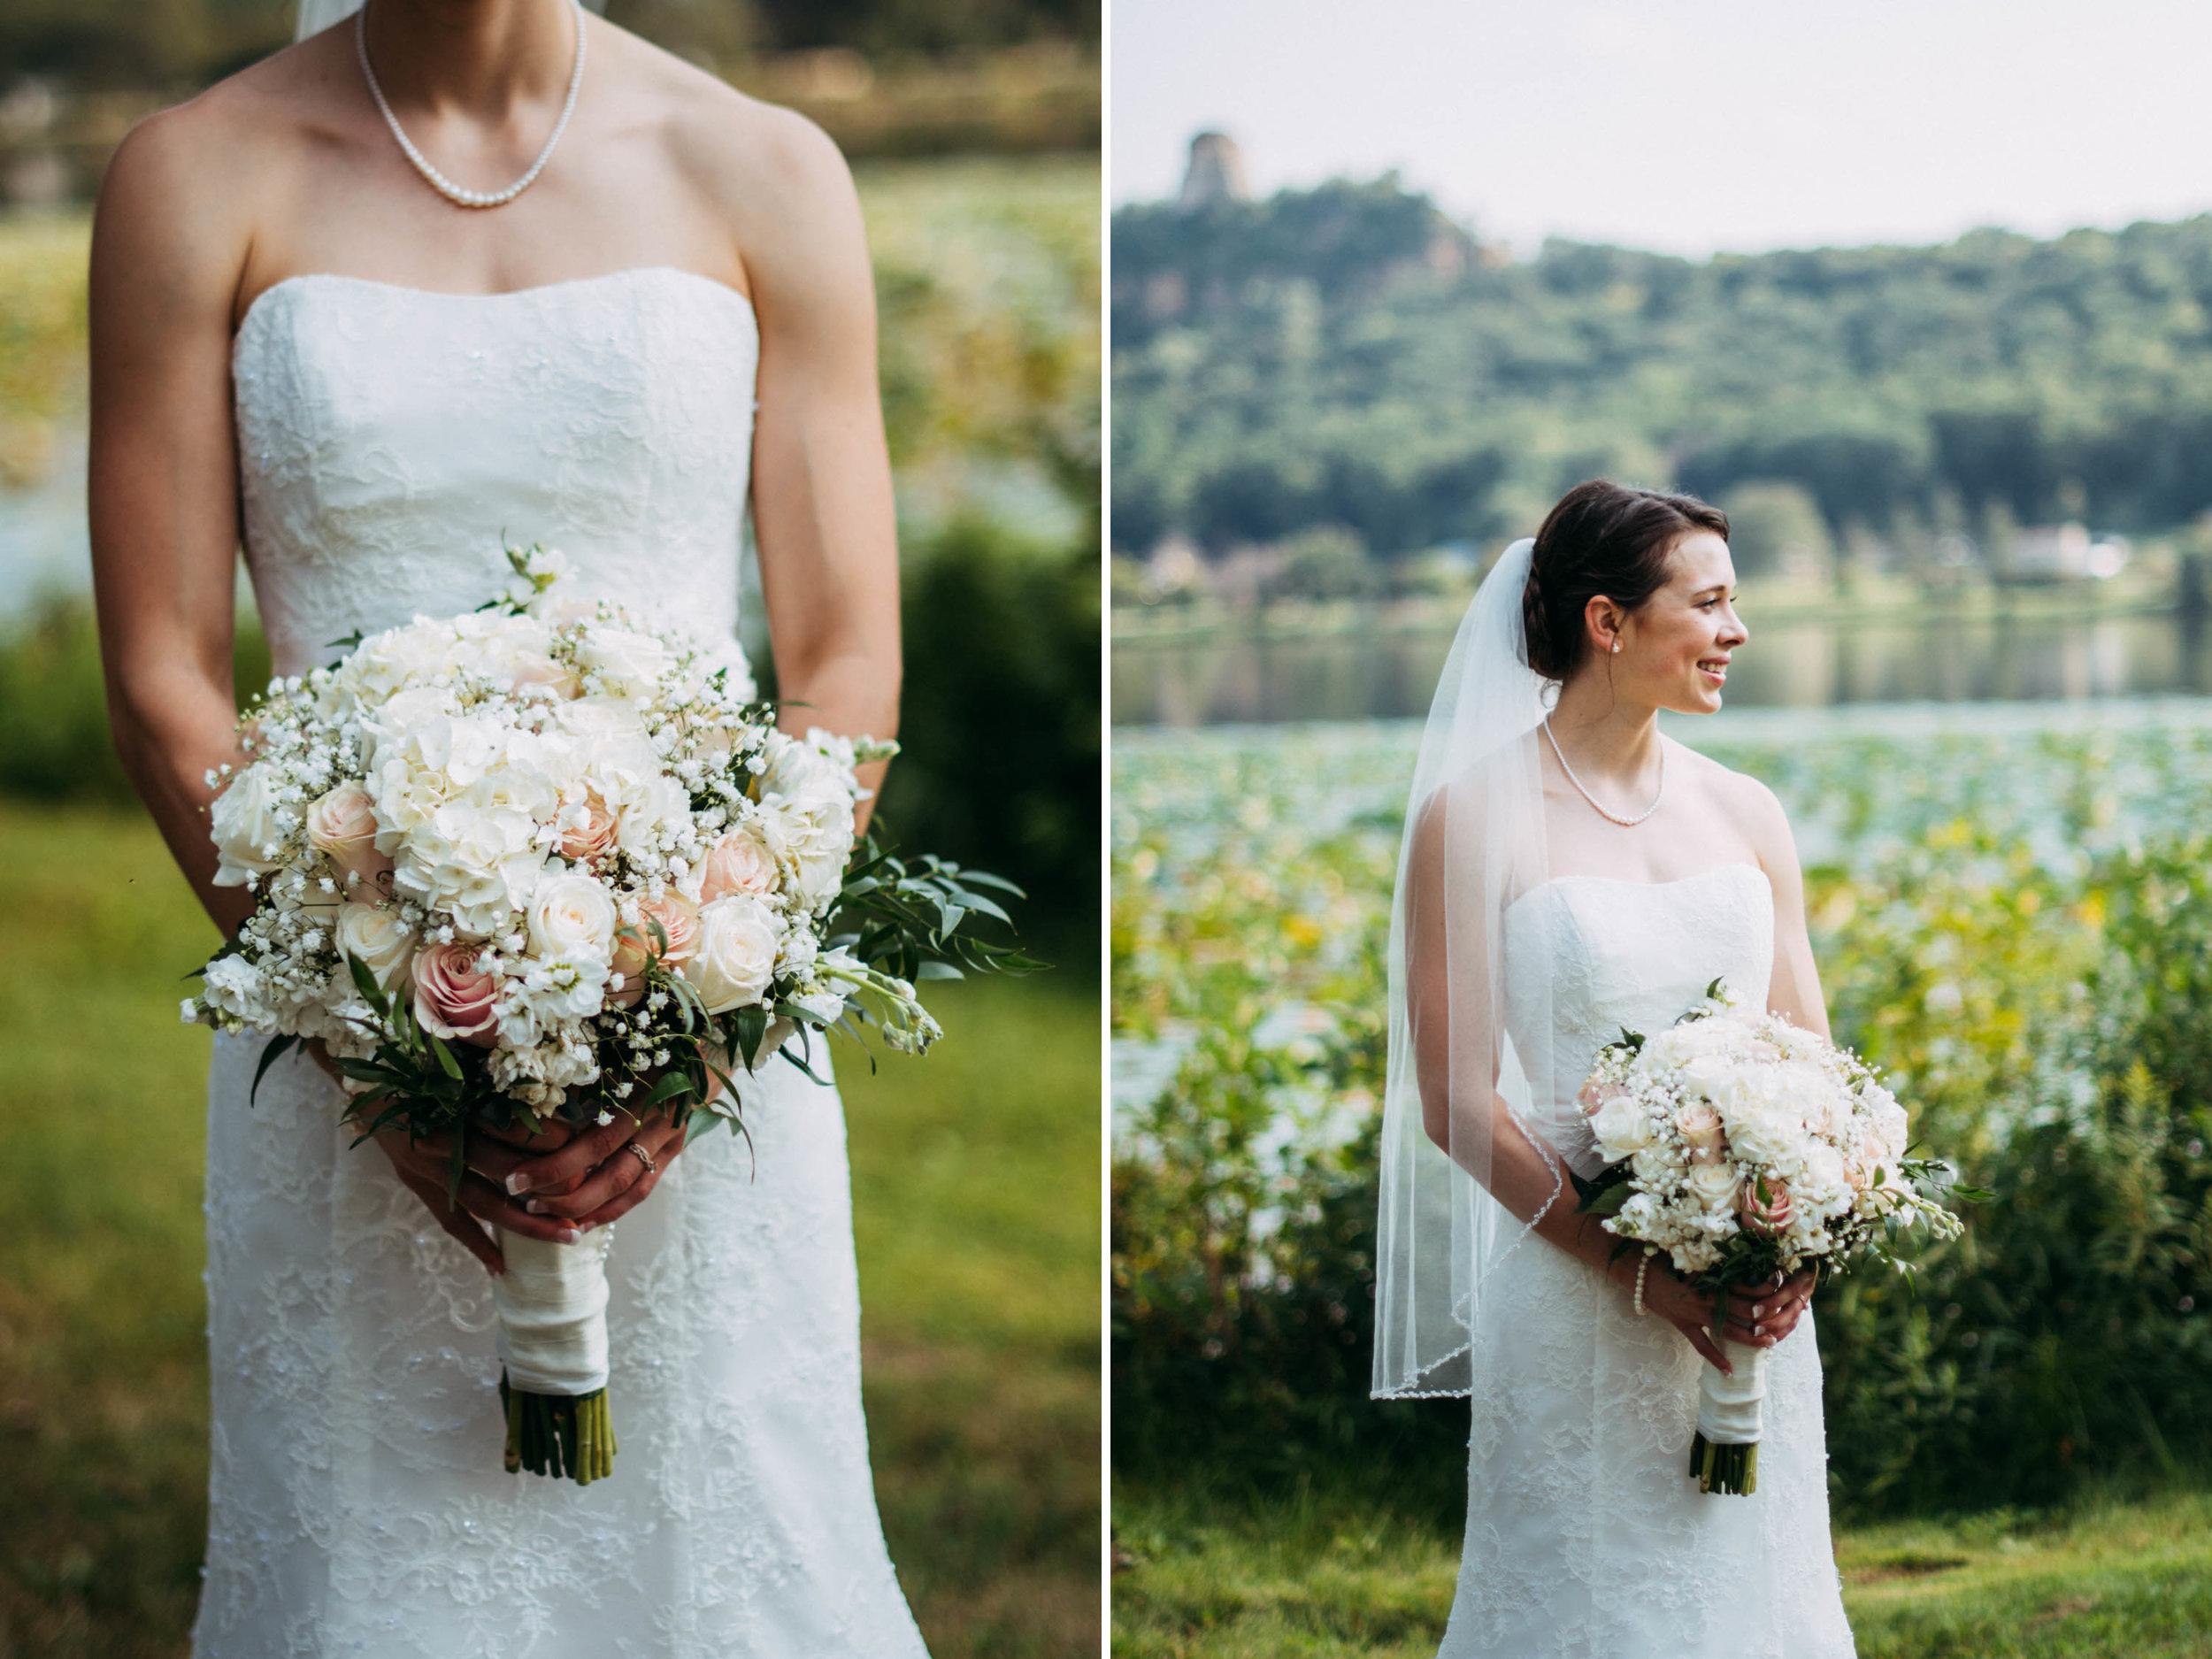 27-Lindsey Jake Bridal Portrait Flowers Winona.jpg